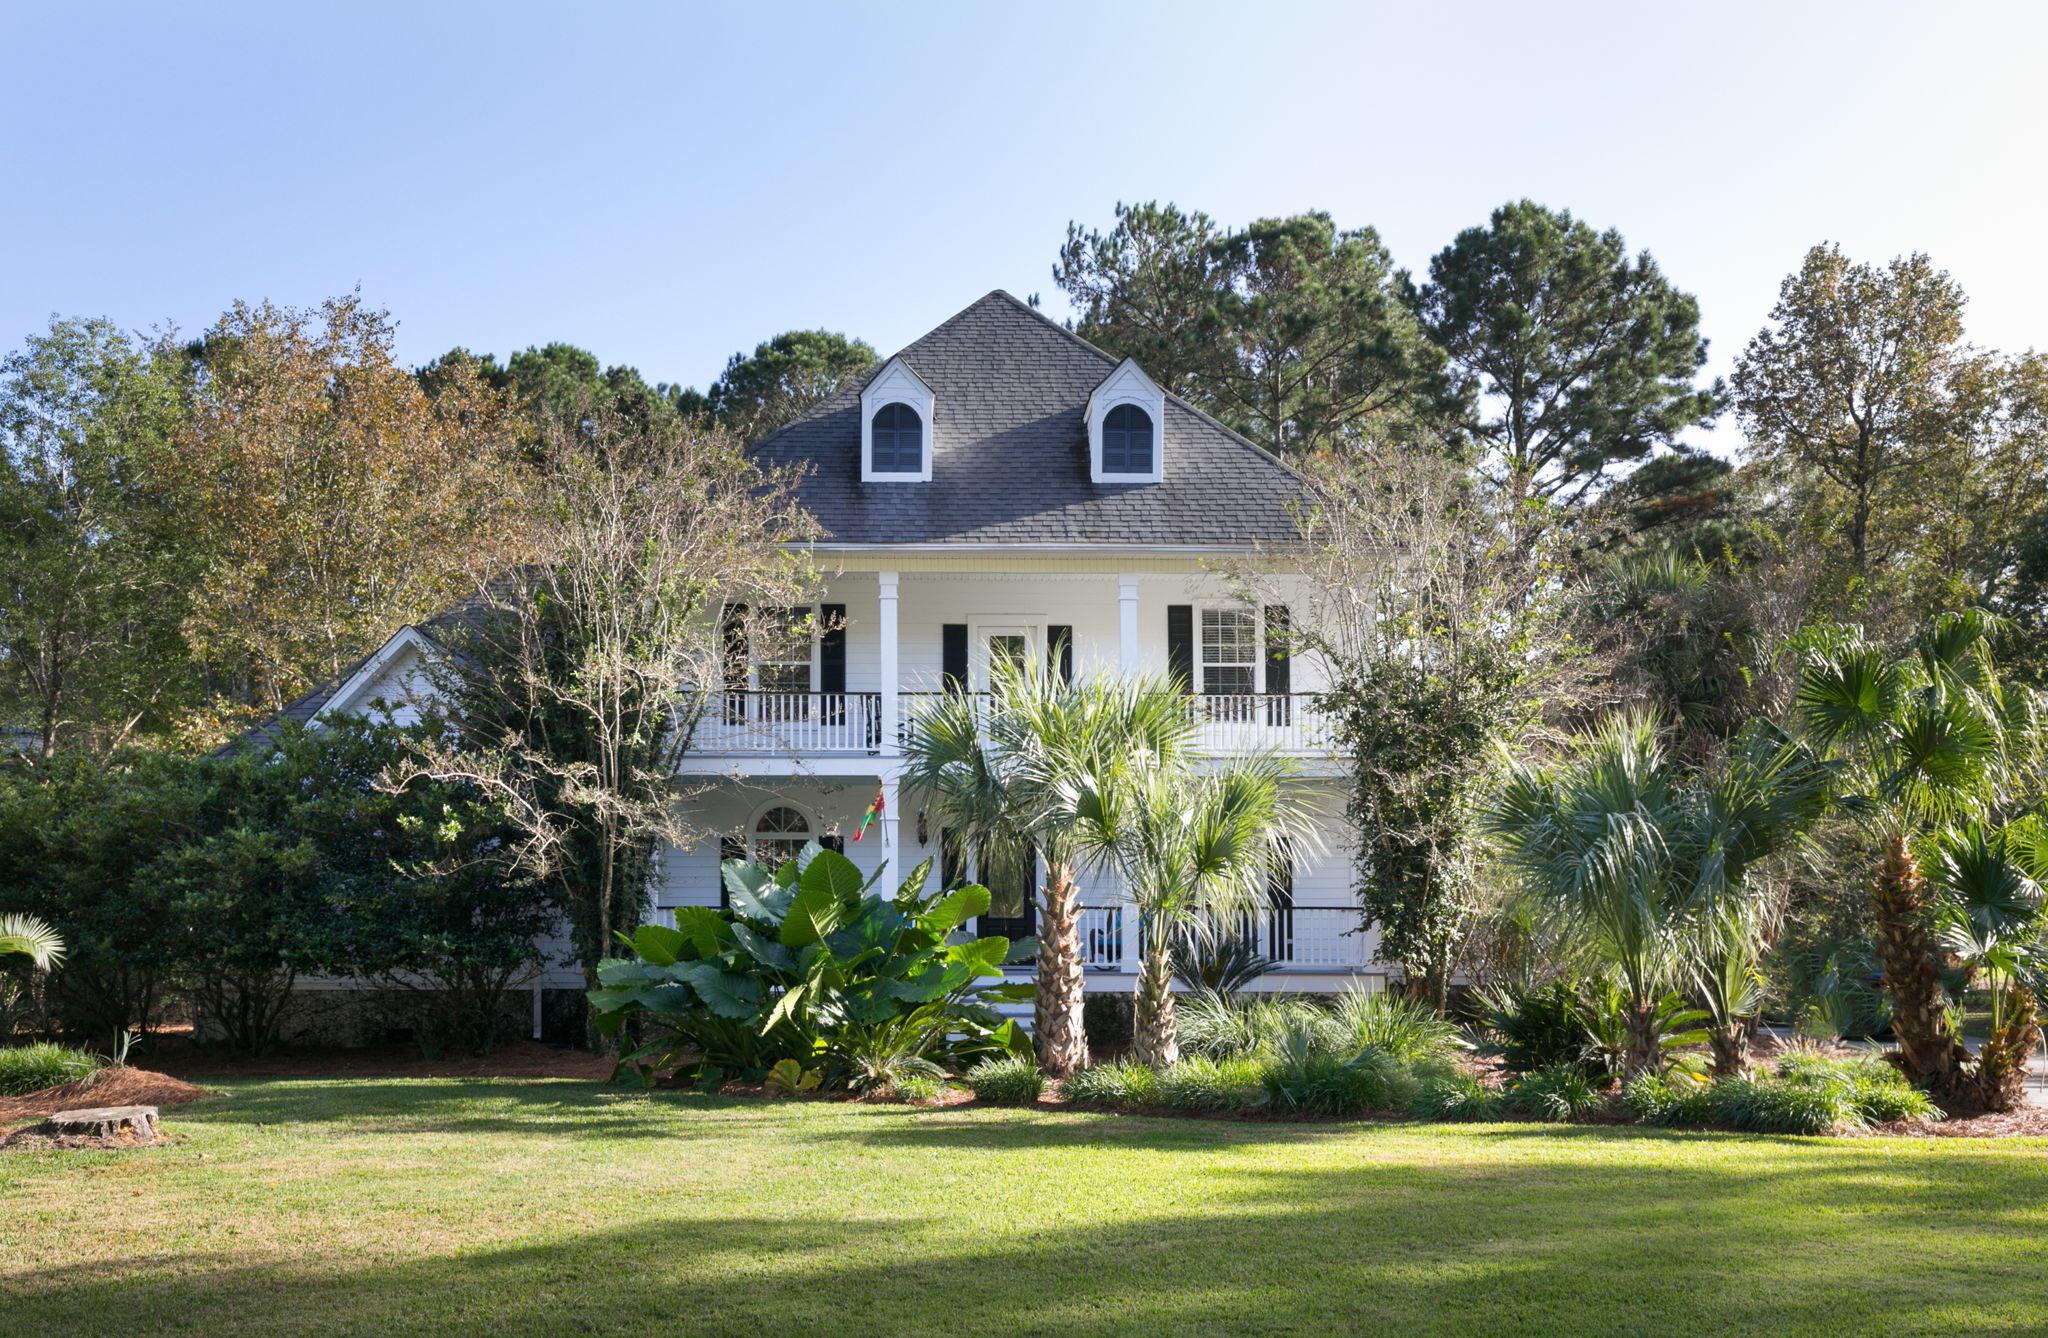 Dunes West Homes For Sale - 3625 Colonel Vanderhorst, Mount Pleasant, SC - 22